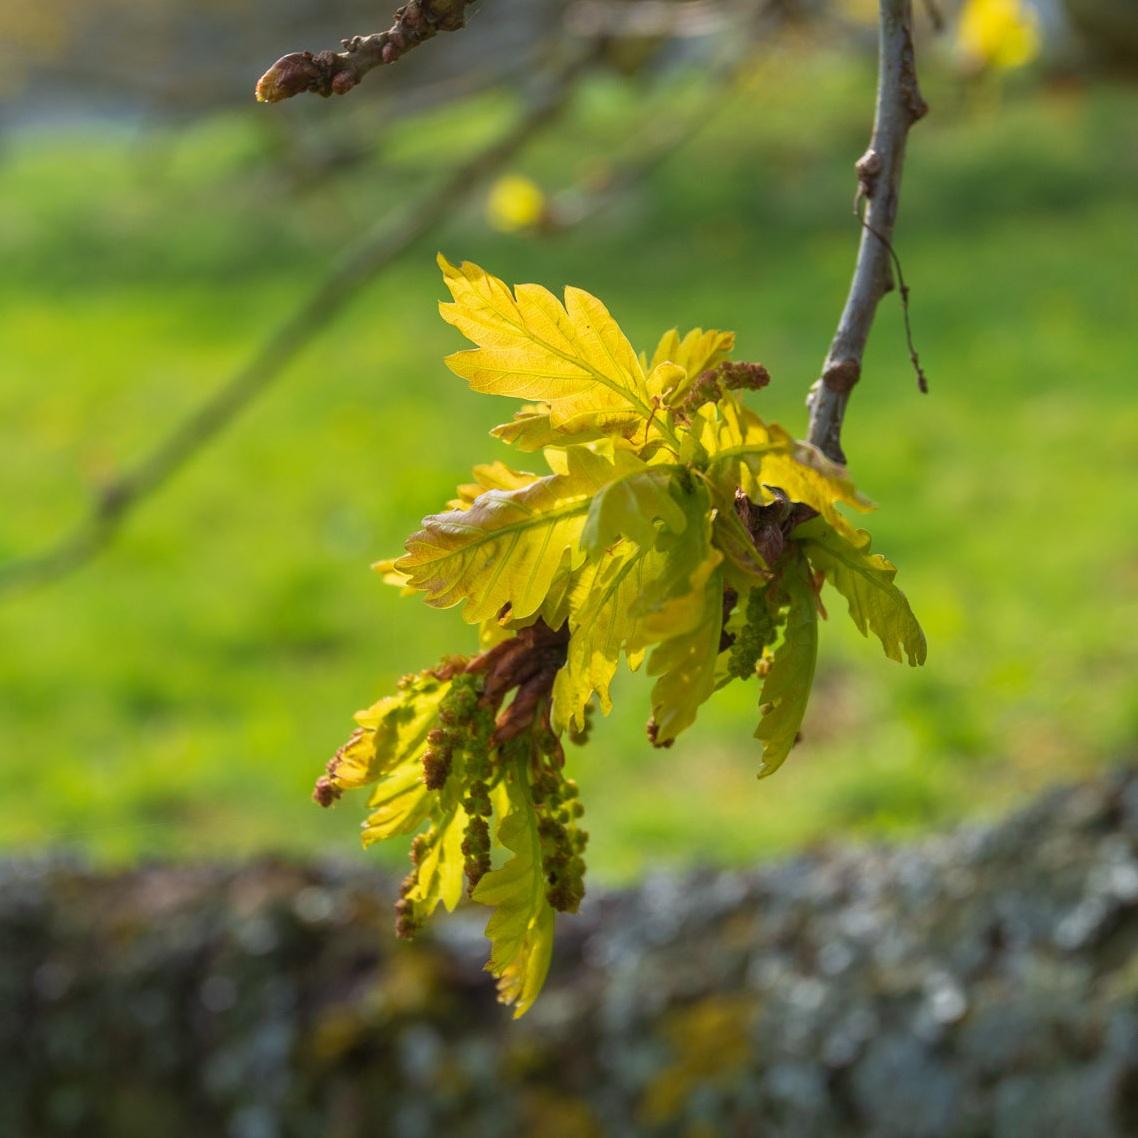 Zytynski-Eastnor-Spring-5533.jpg